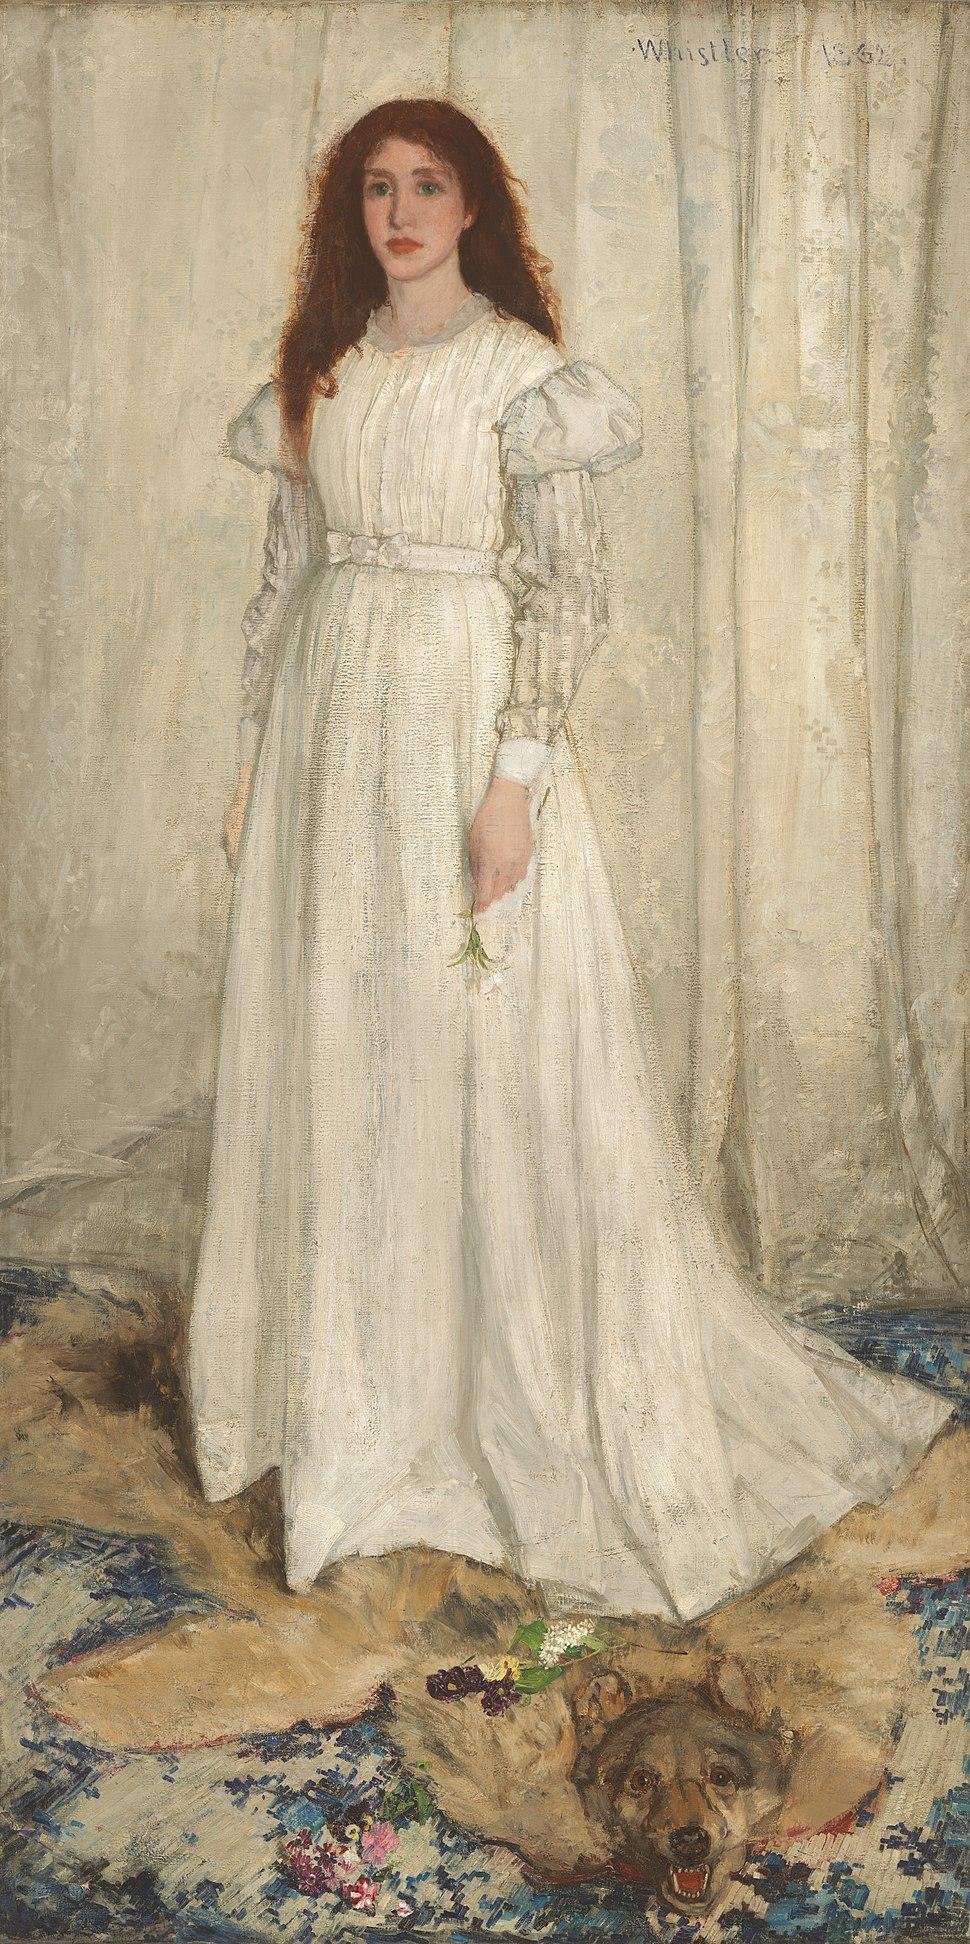 Whistler James Symphony in White no 1 (The White Girl) 1862